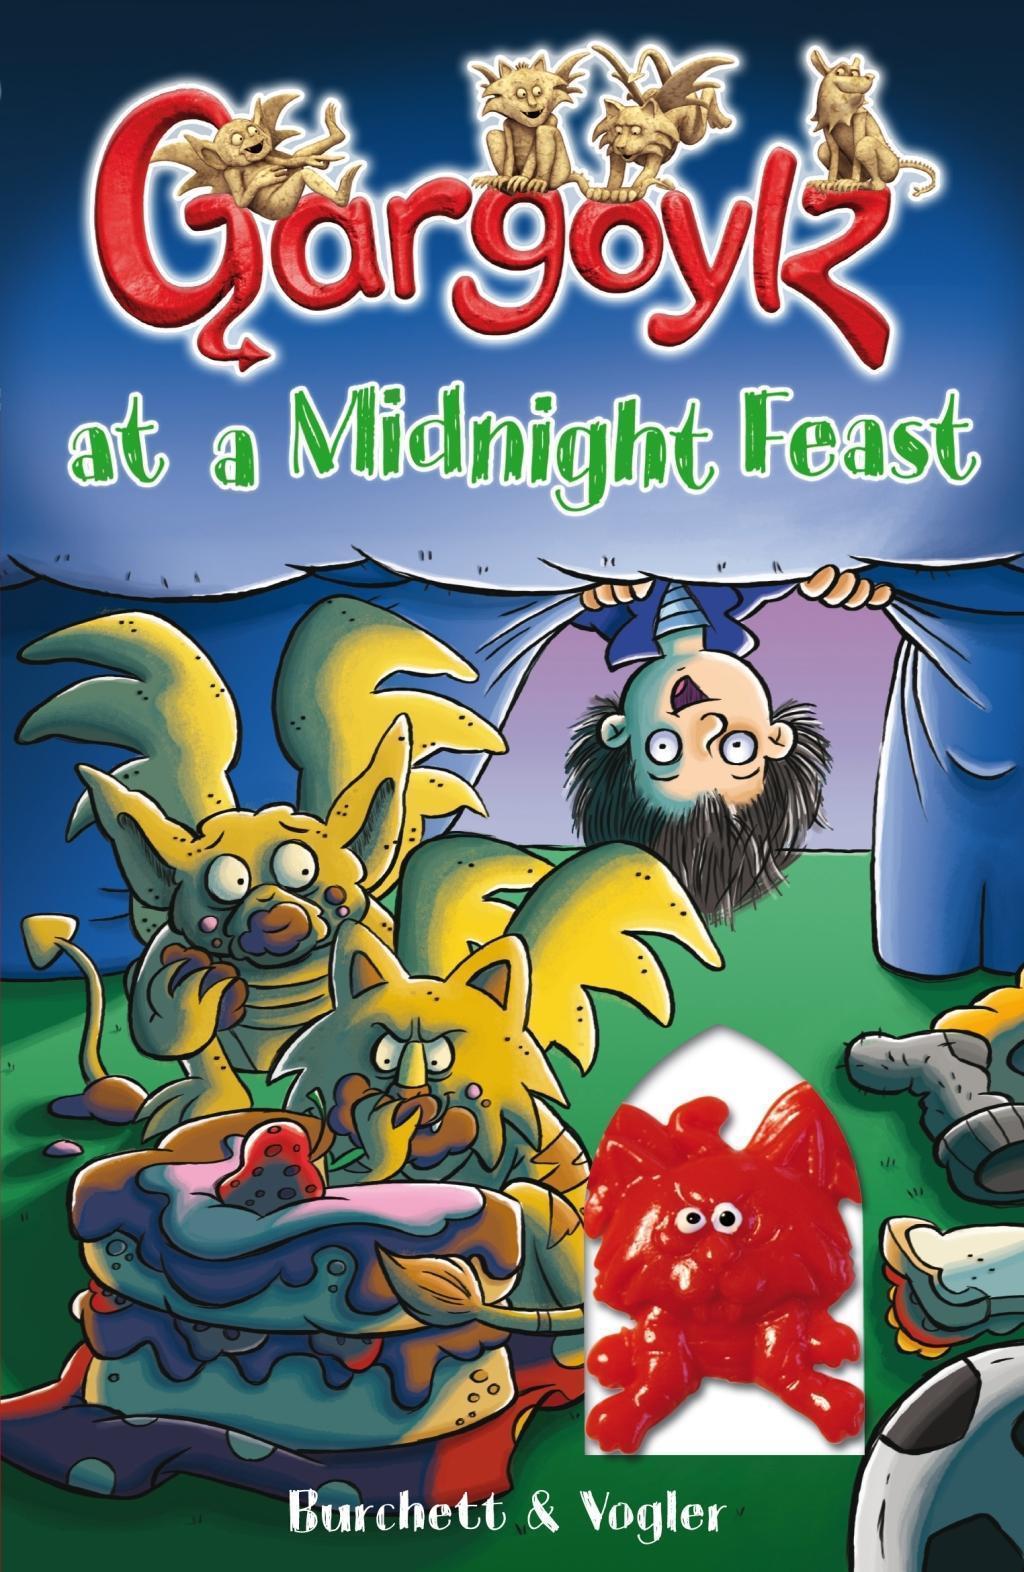 Gargoylz at a Midnight Feast